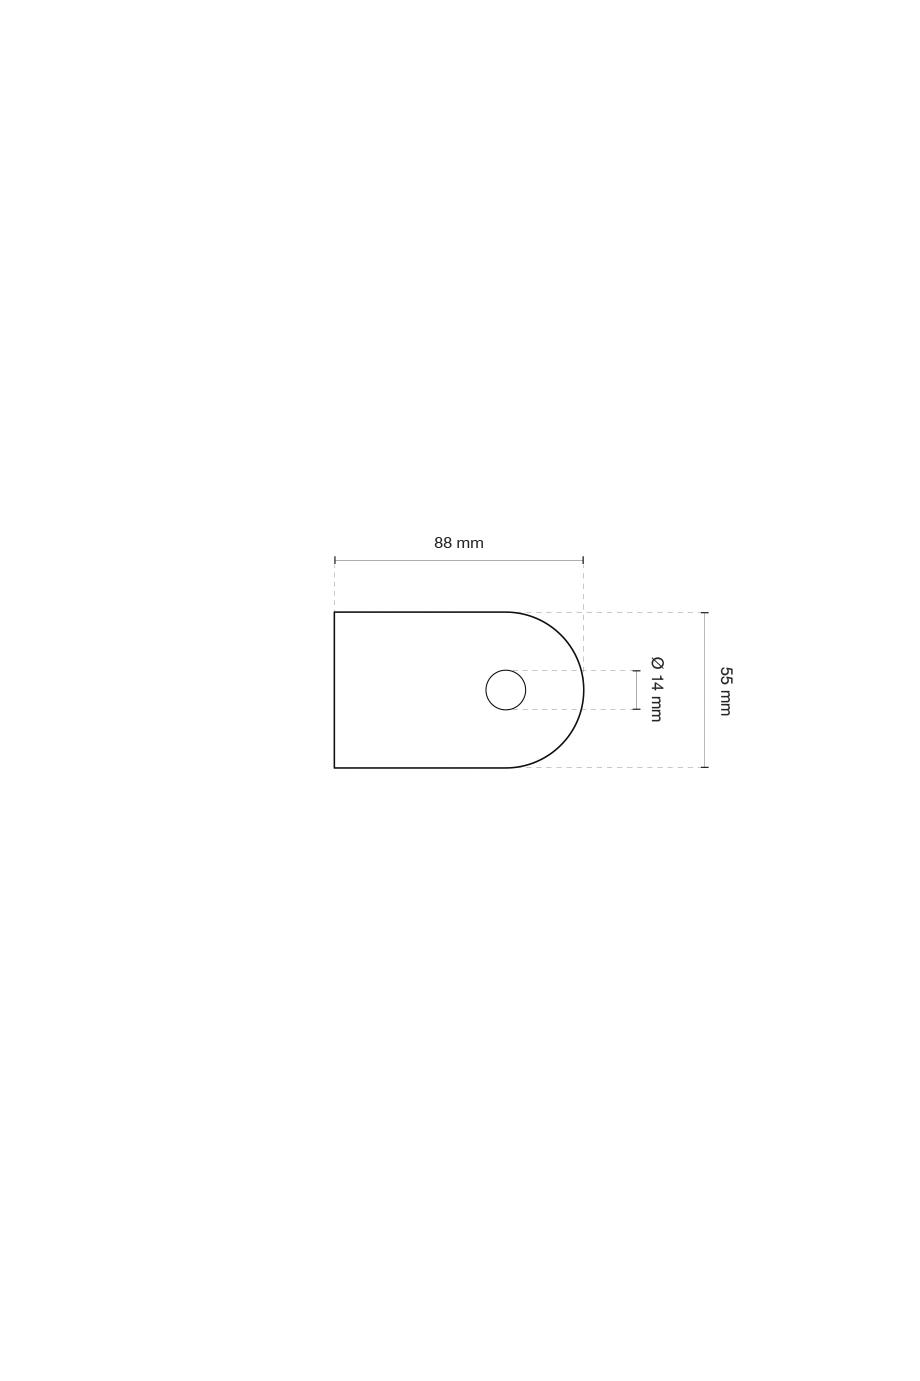 bitpart-dimensions-backplate-thin d.jpg